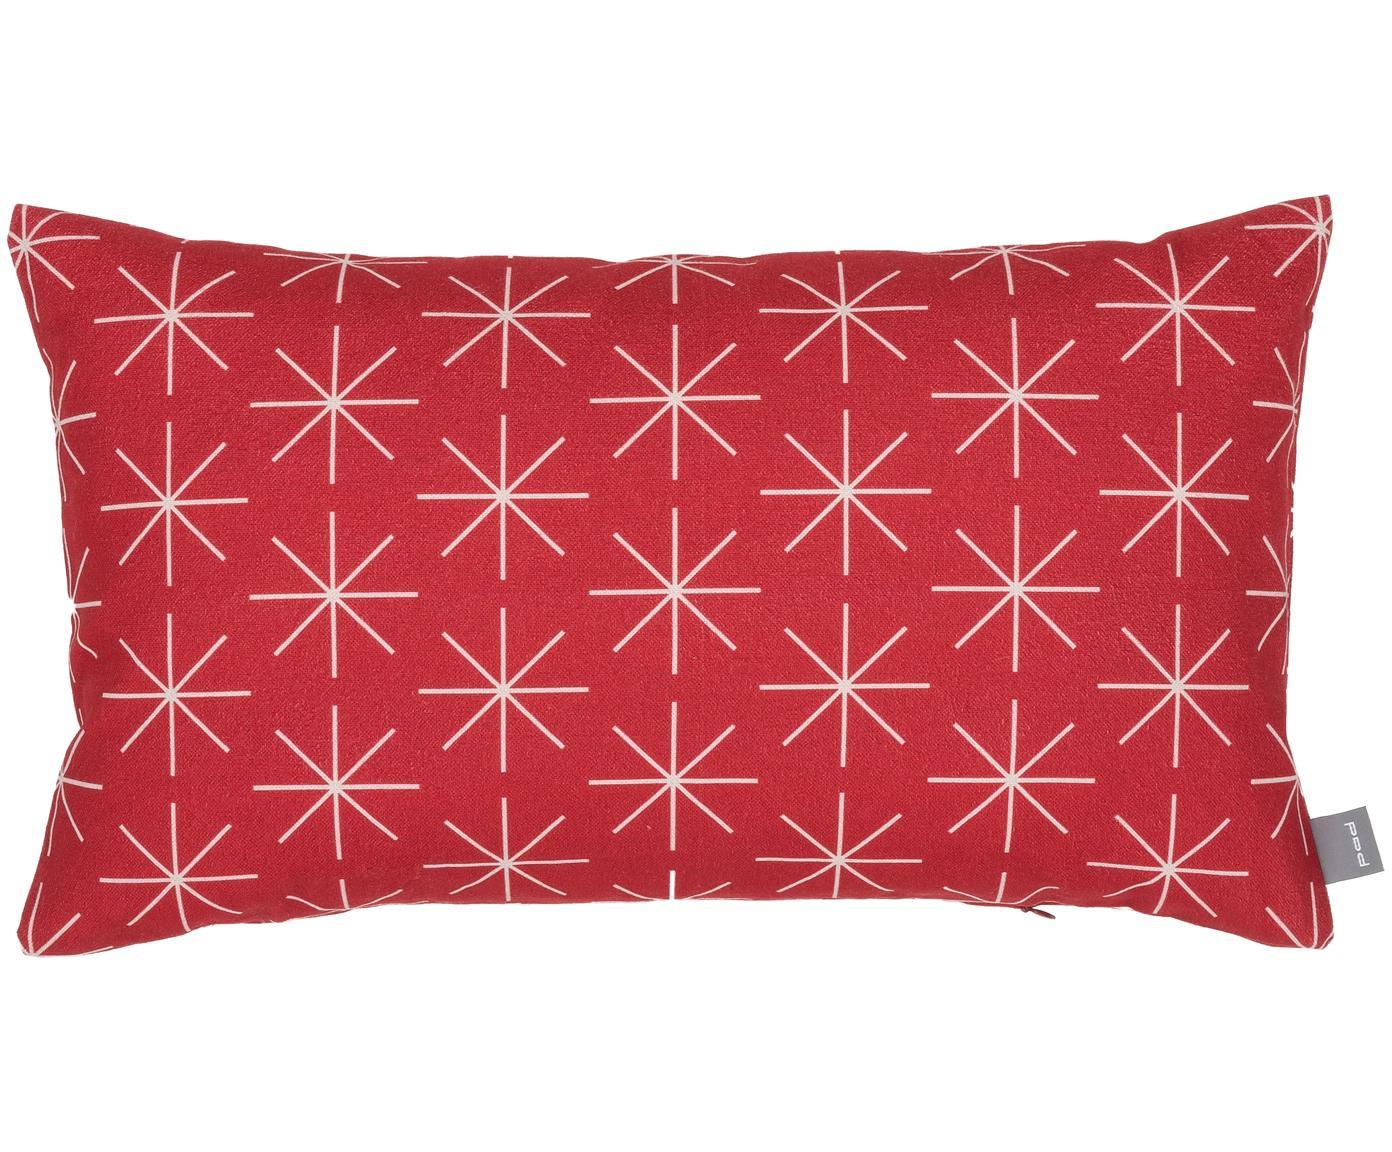 Kussenhoes Stella, Katoen, Rood, gebroken wit, 30 x 50 cm